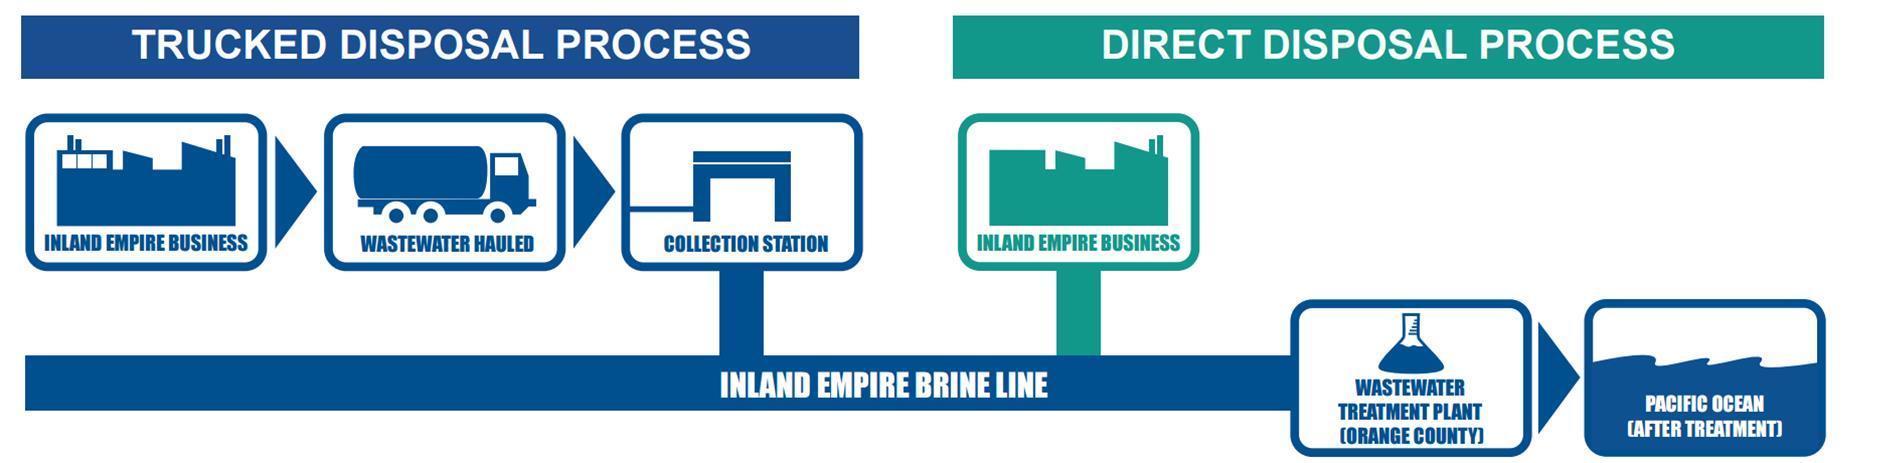 Brine-Line-Image-7